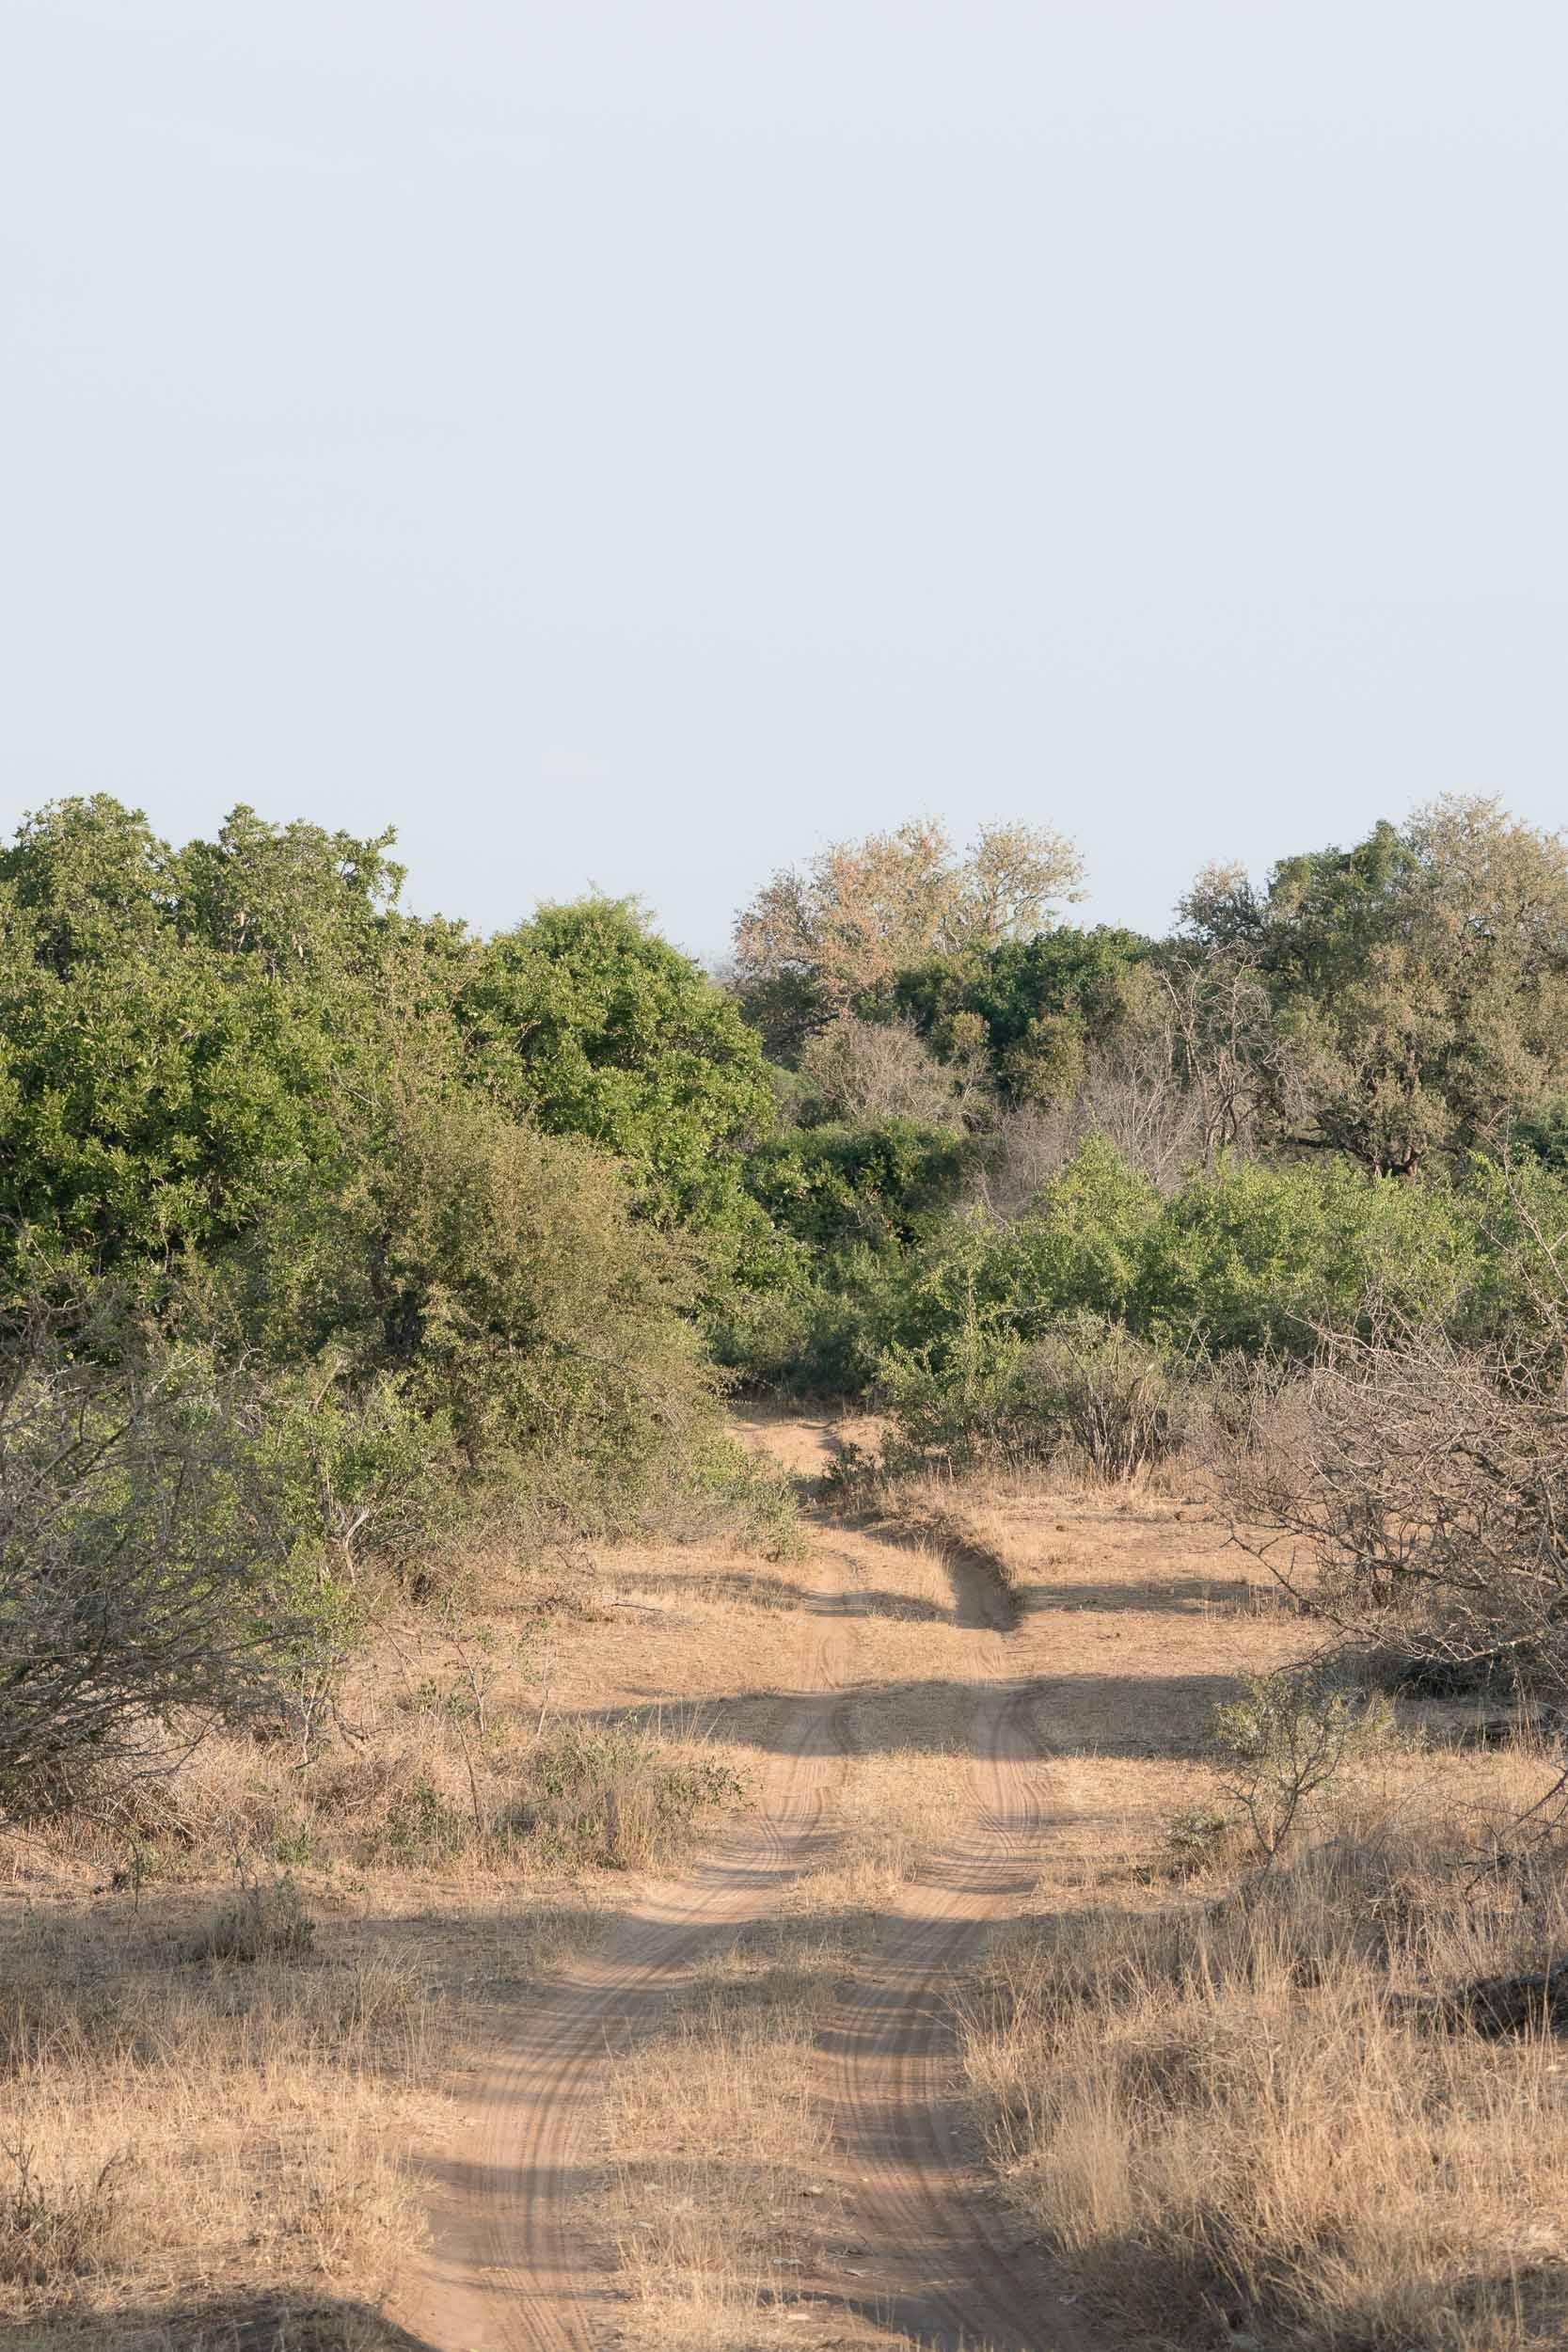 the_getaway_edit_south_africa_safari_lion_sands_game_reserve-1.jpg